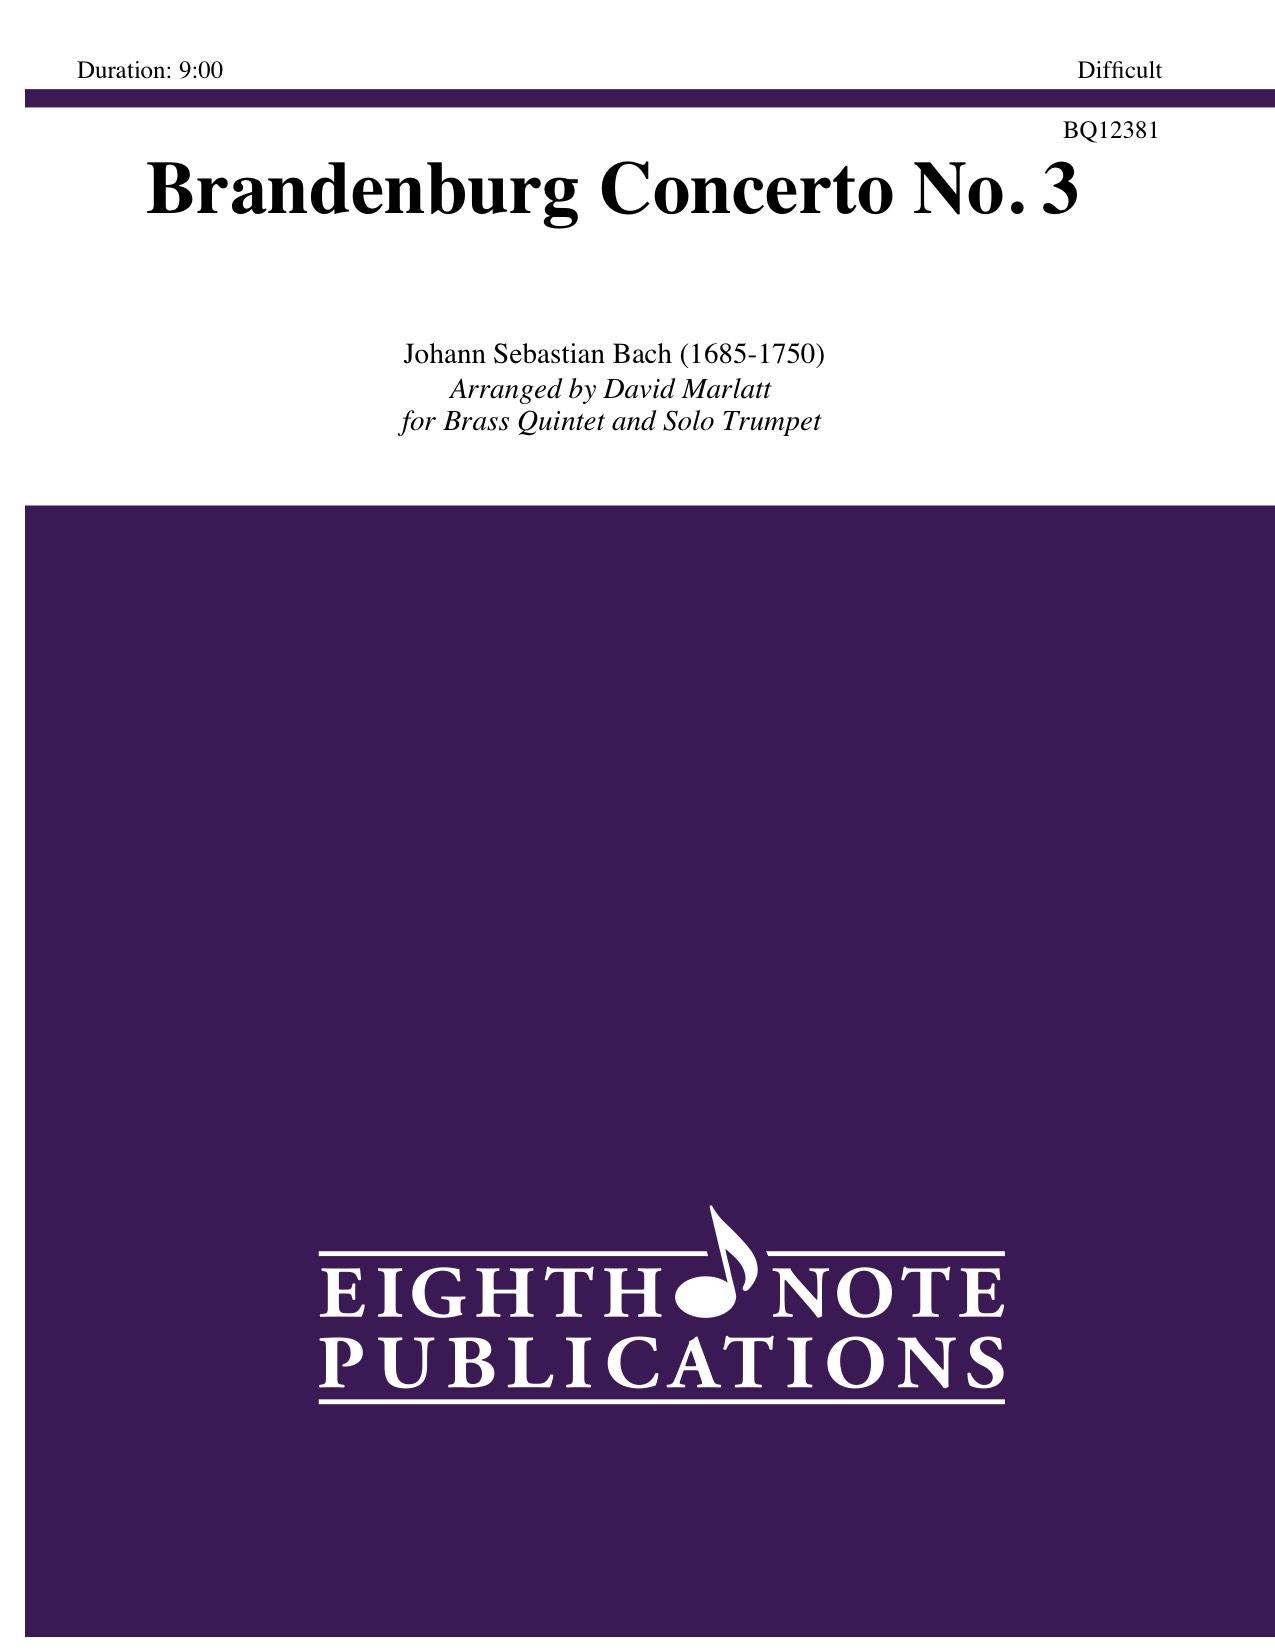 Brandenburg Concerto #3 - Johann Sebastian Bach